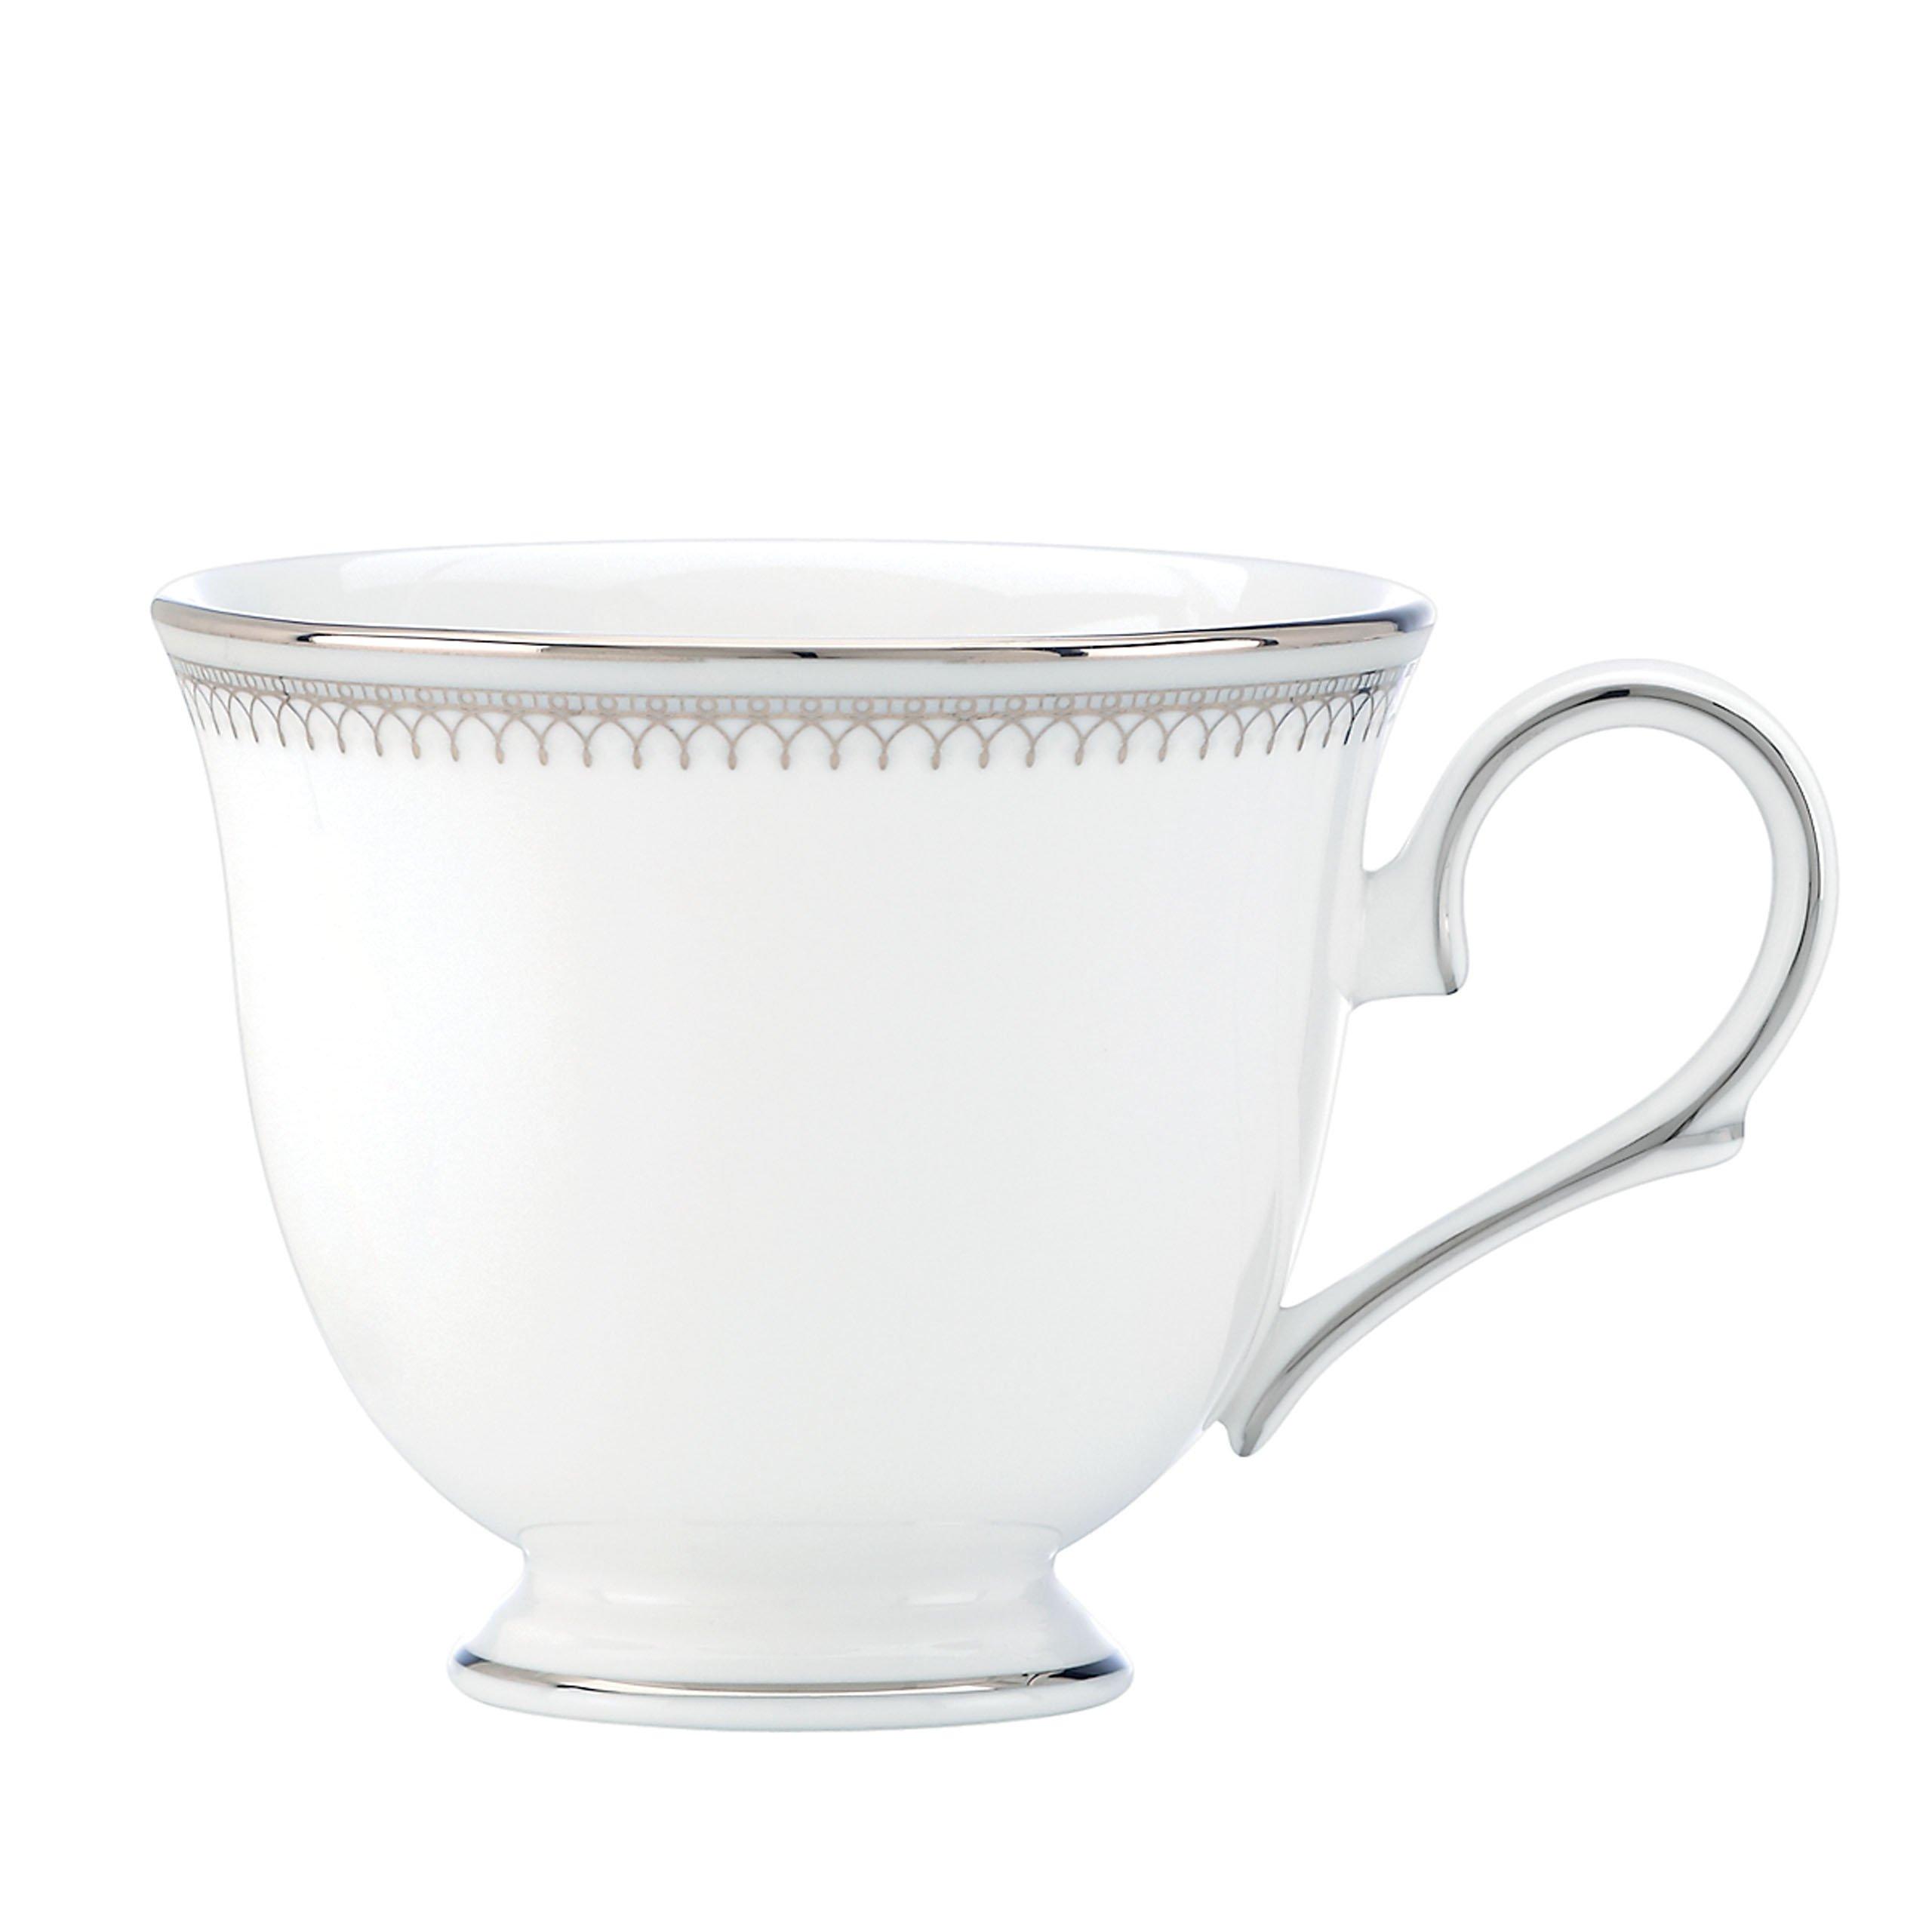 Lenox Belle Haven Footed Tea Cup